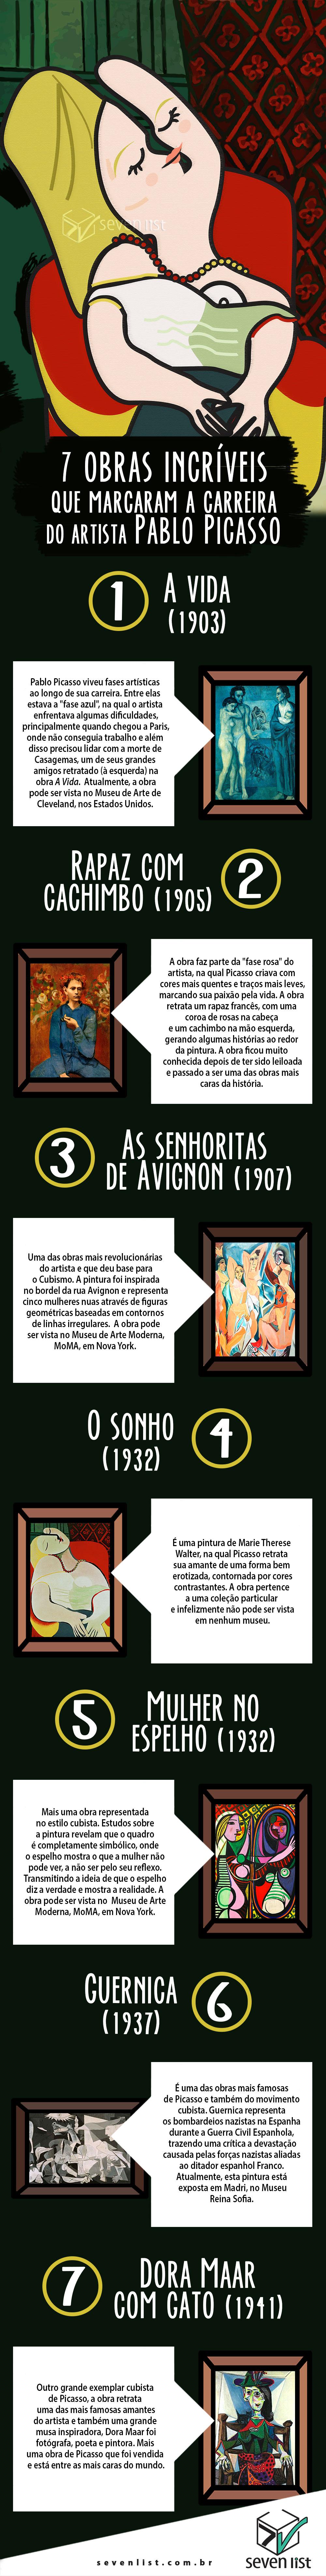 OBRAS PABLO PICASSO - SEVEN LIST